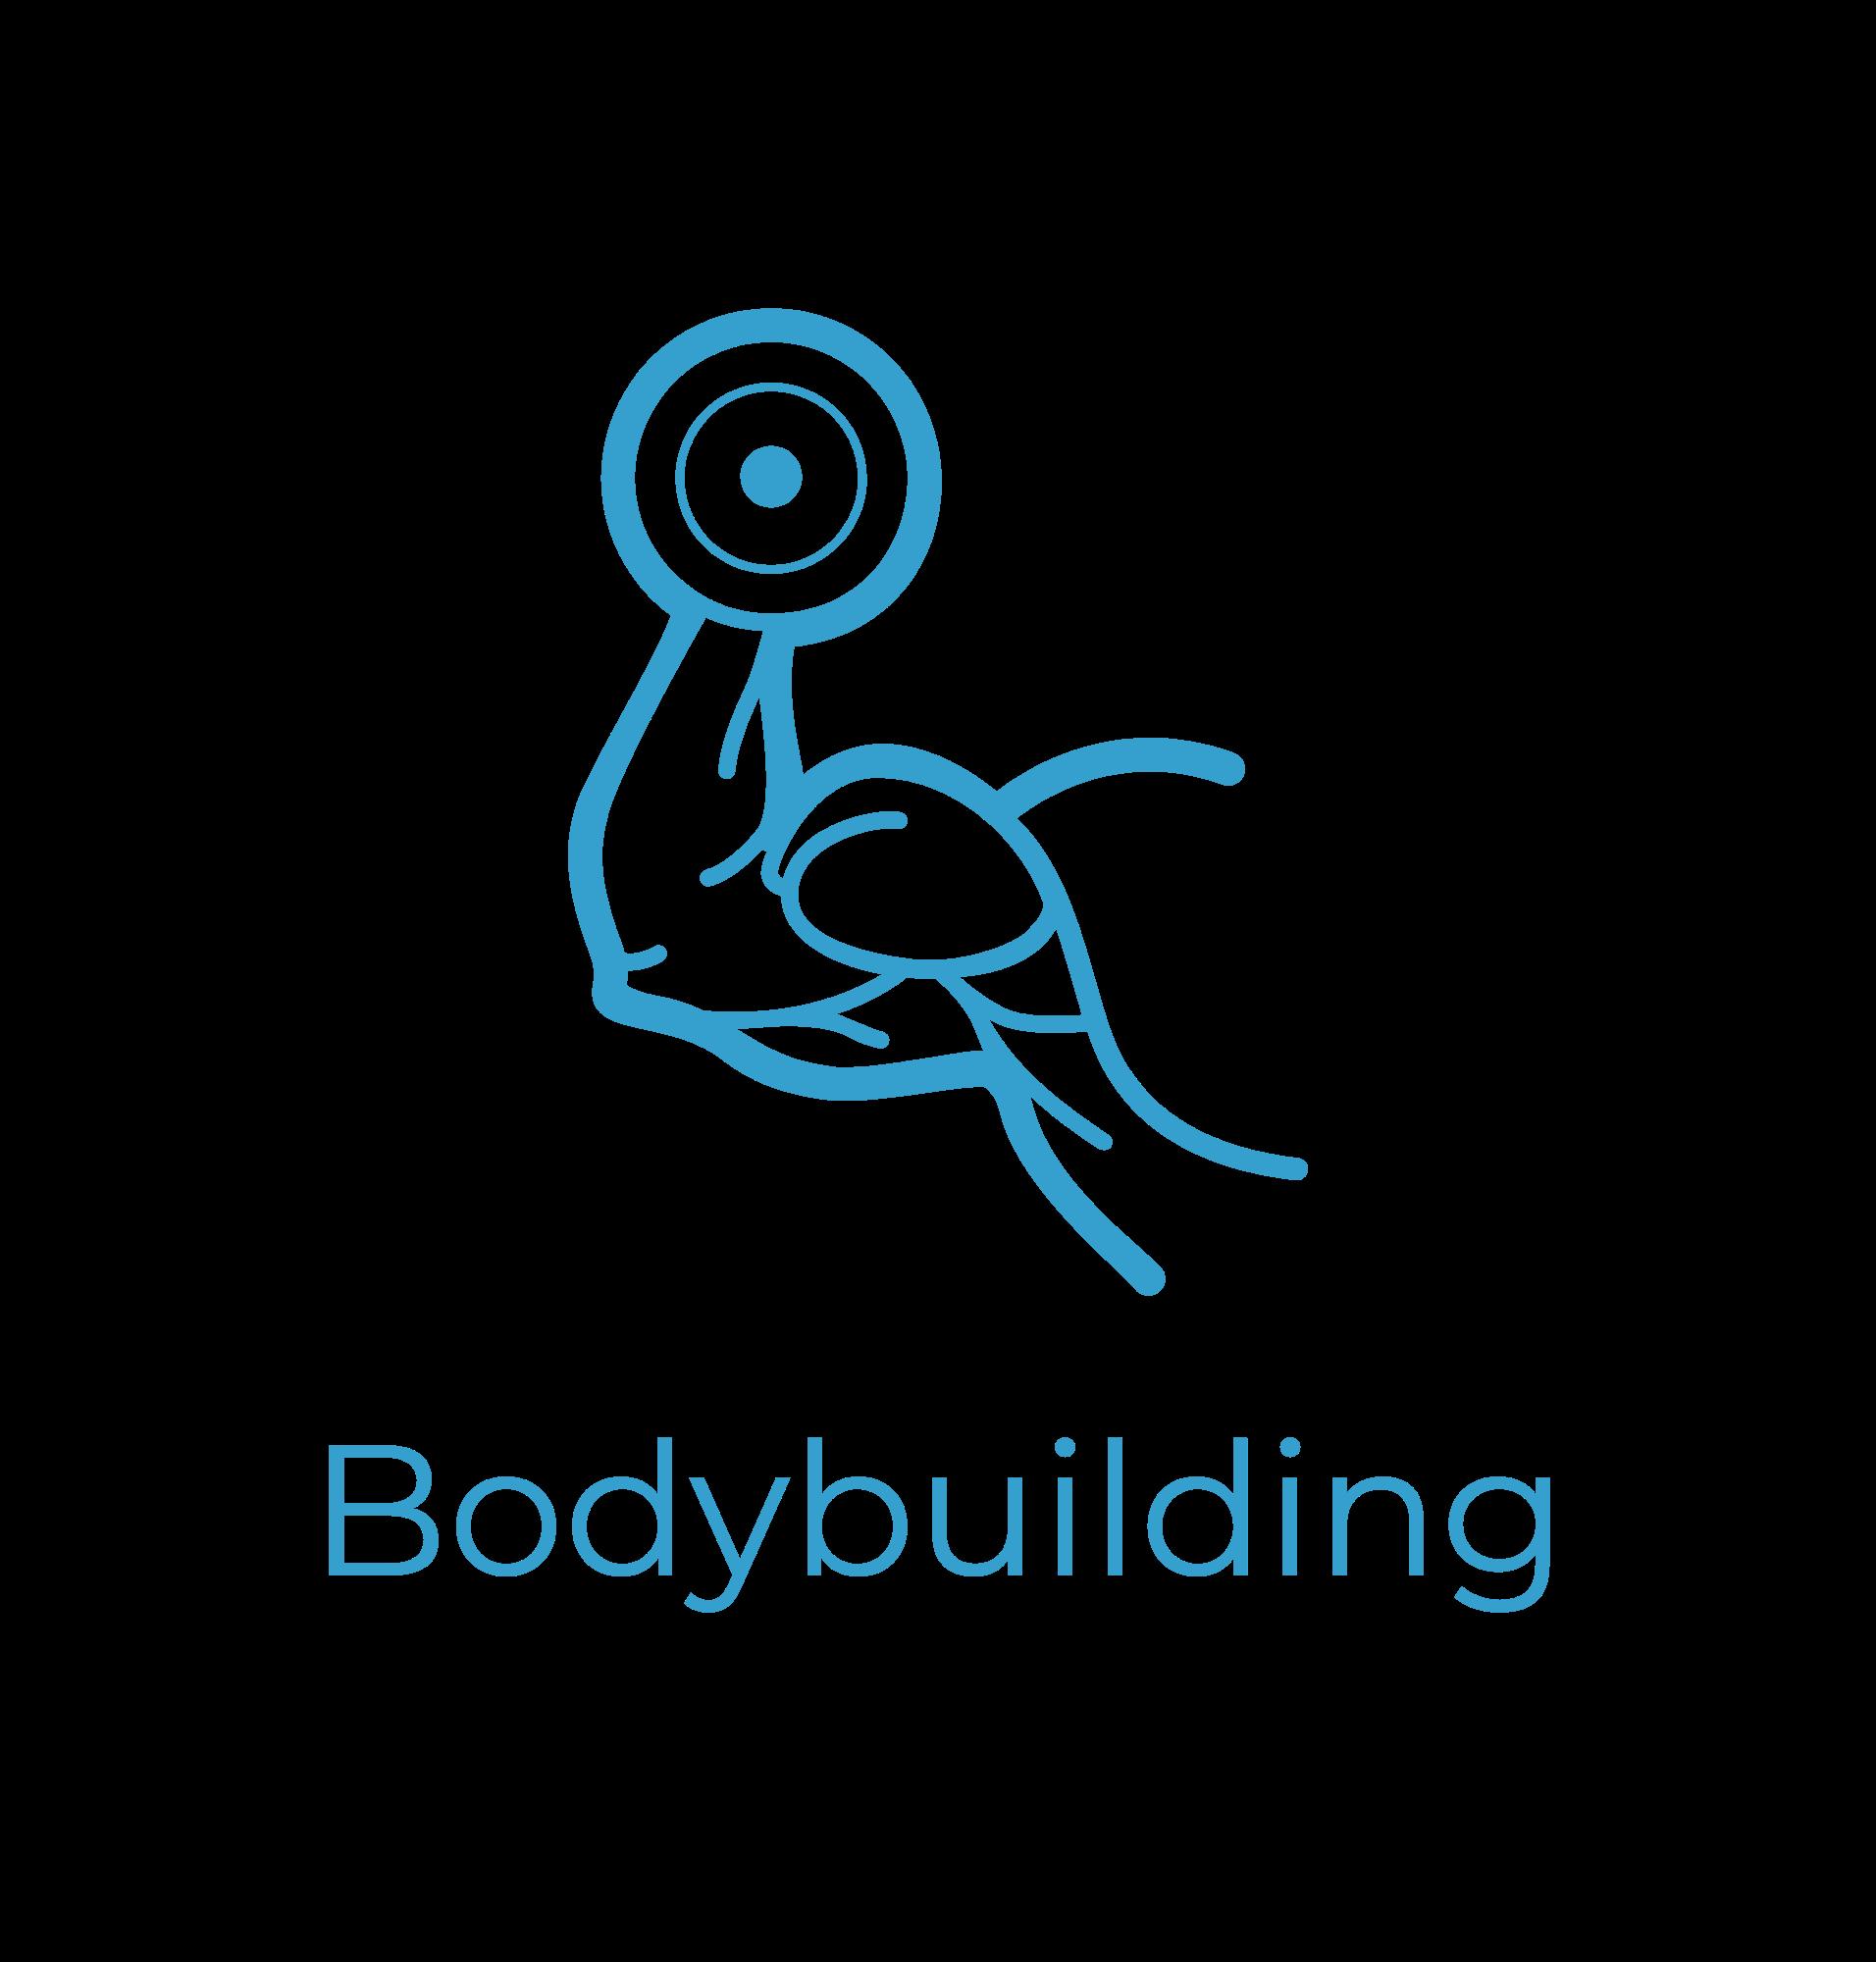 bodybuilding logo.png